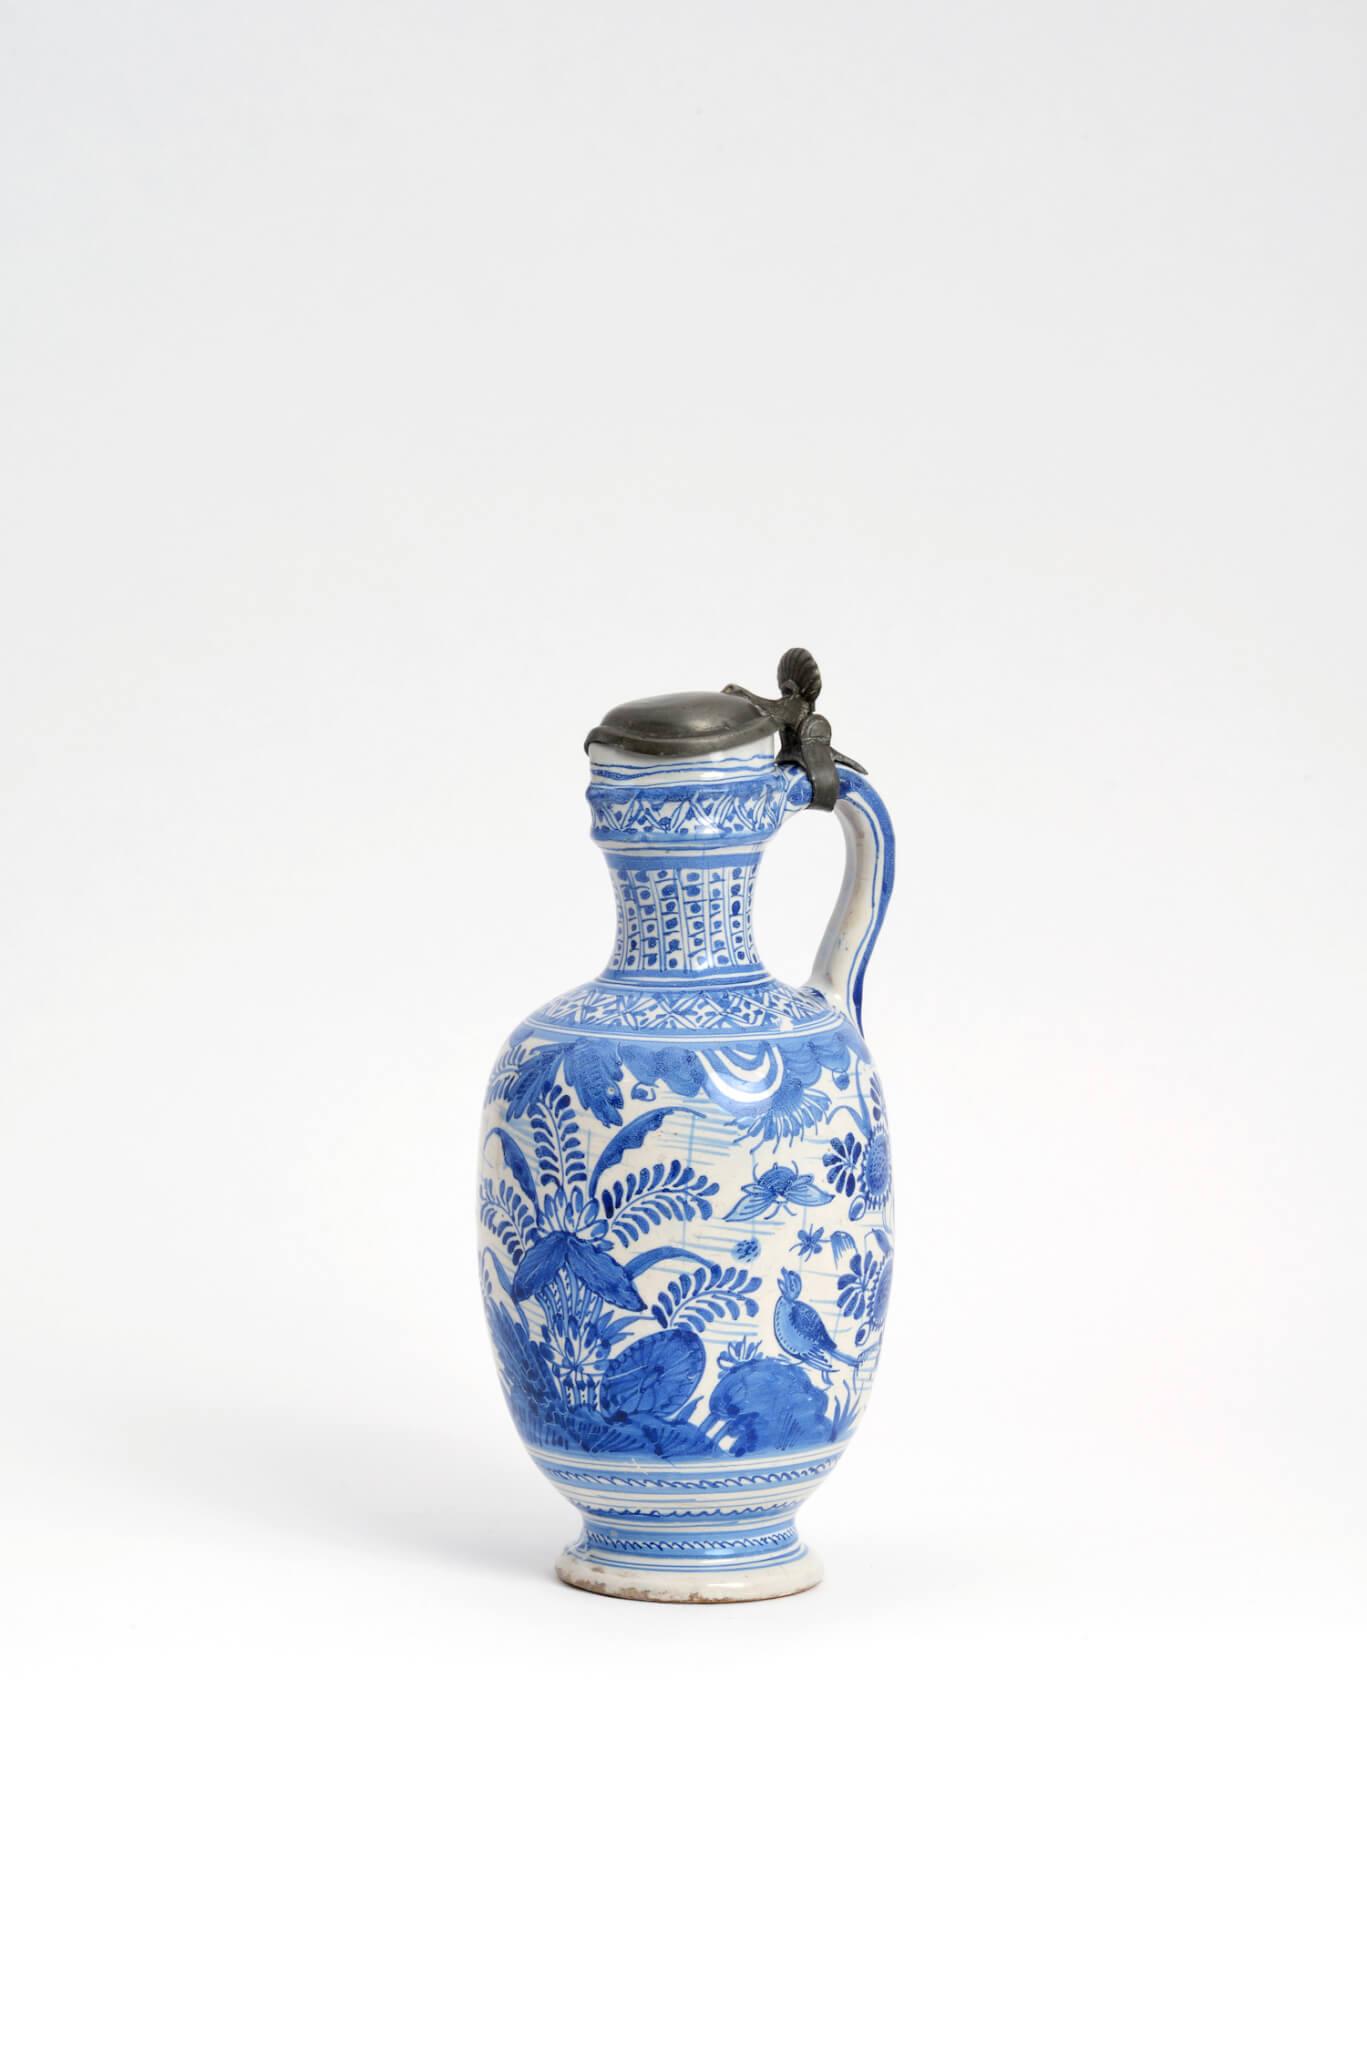 Delftware ovoid jug Aronson Antiquairs